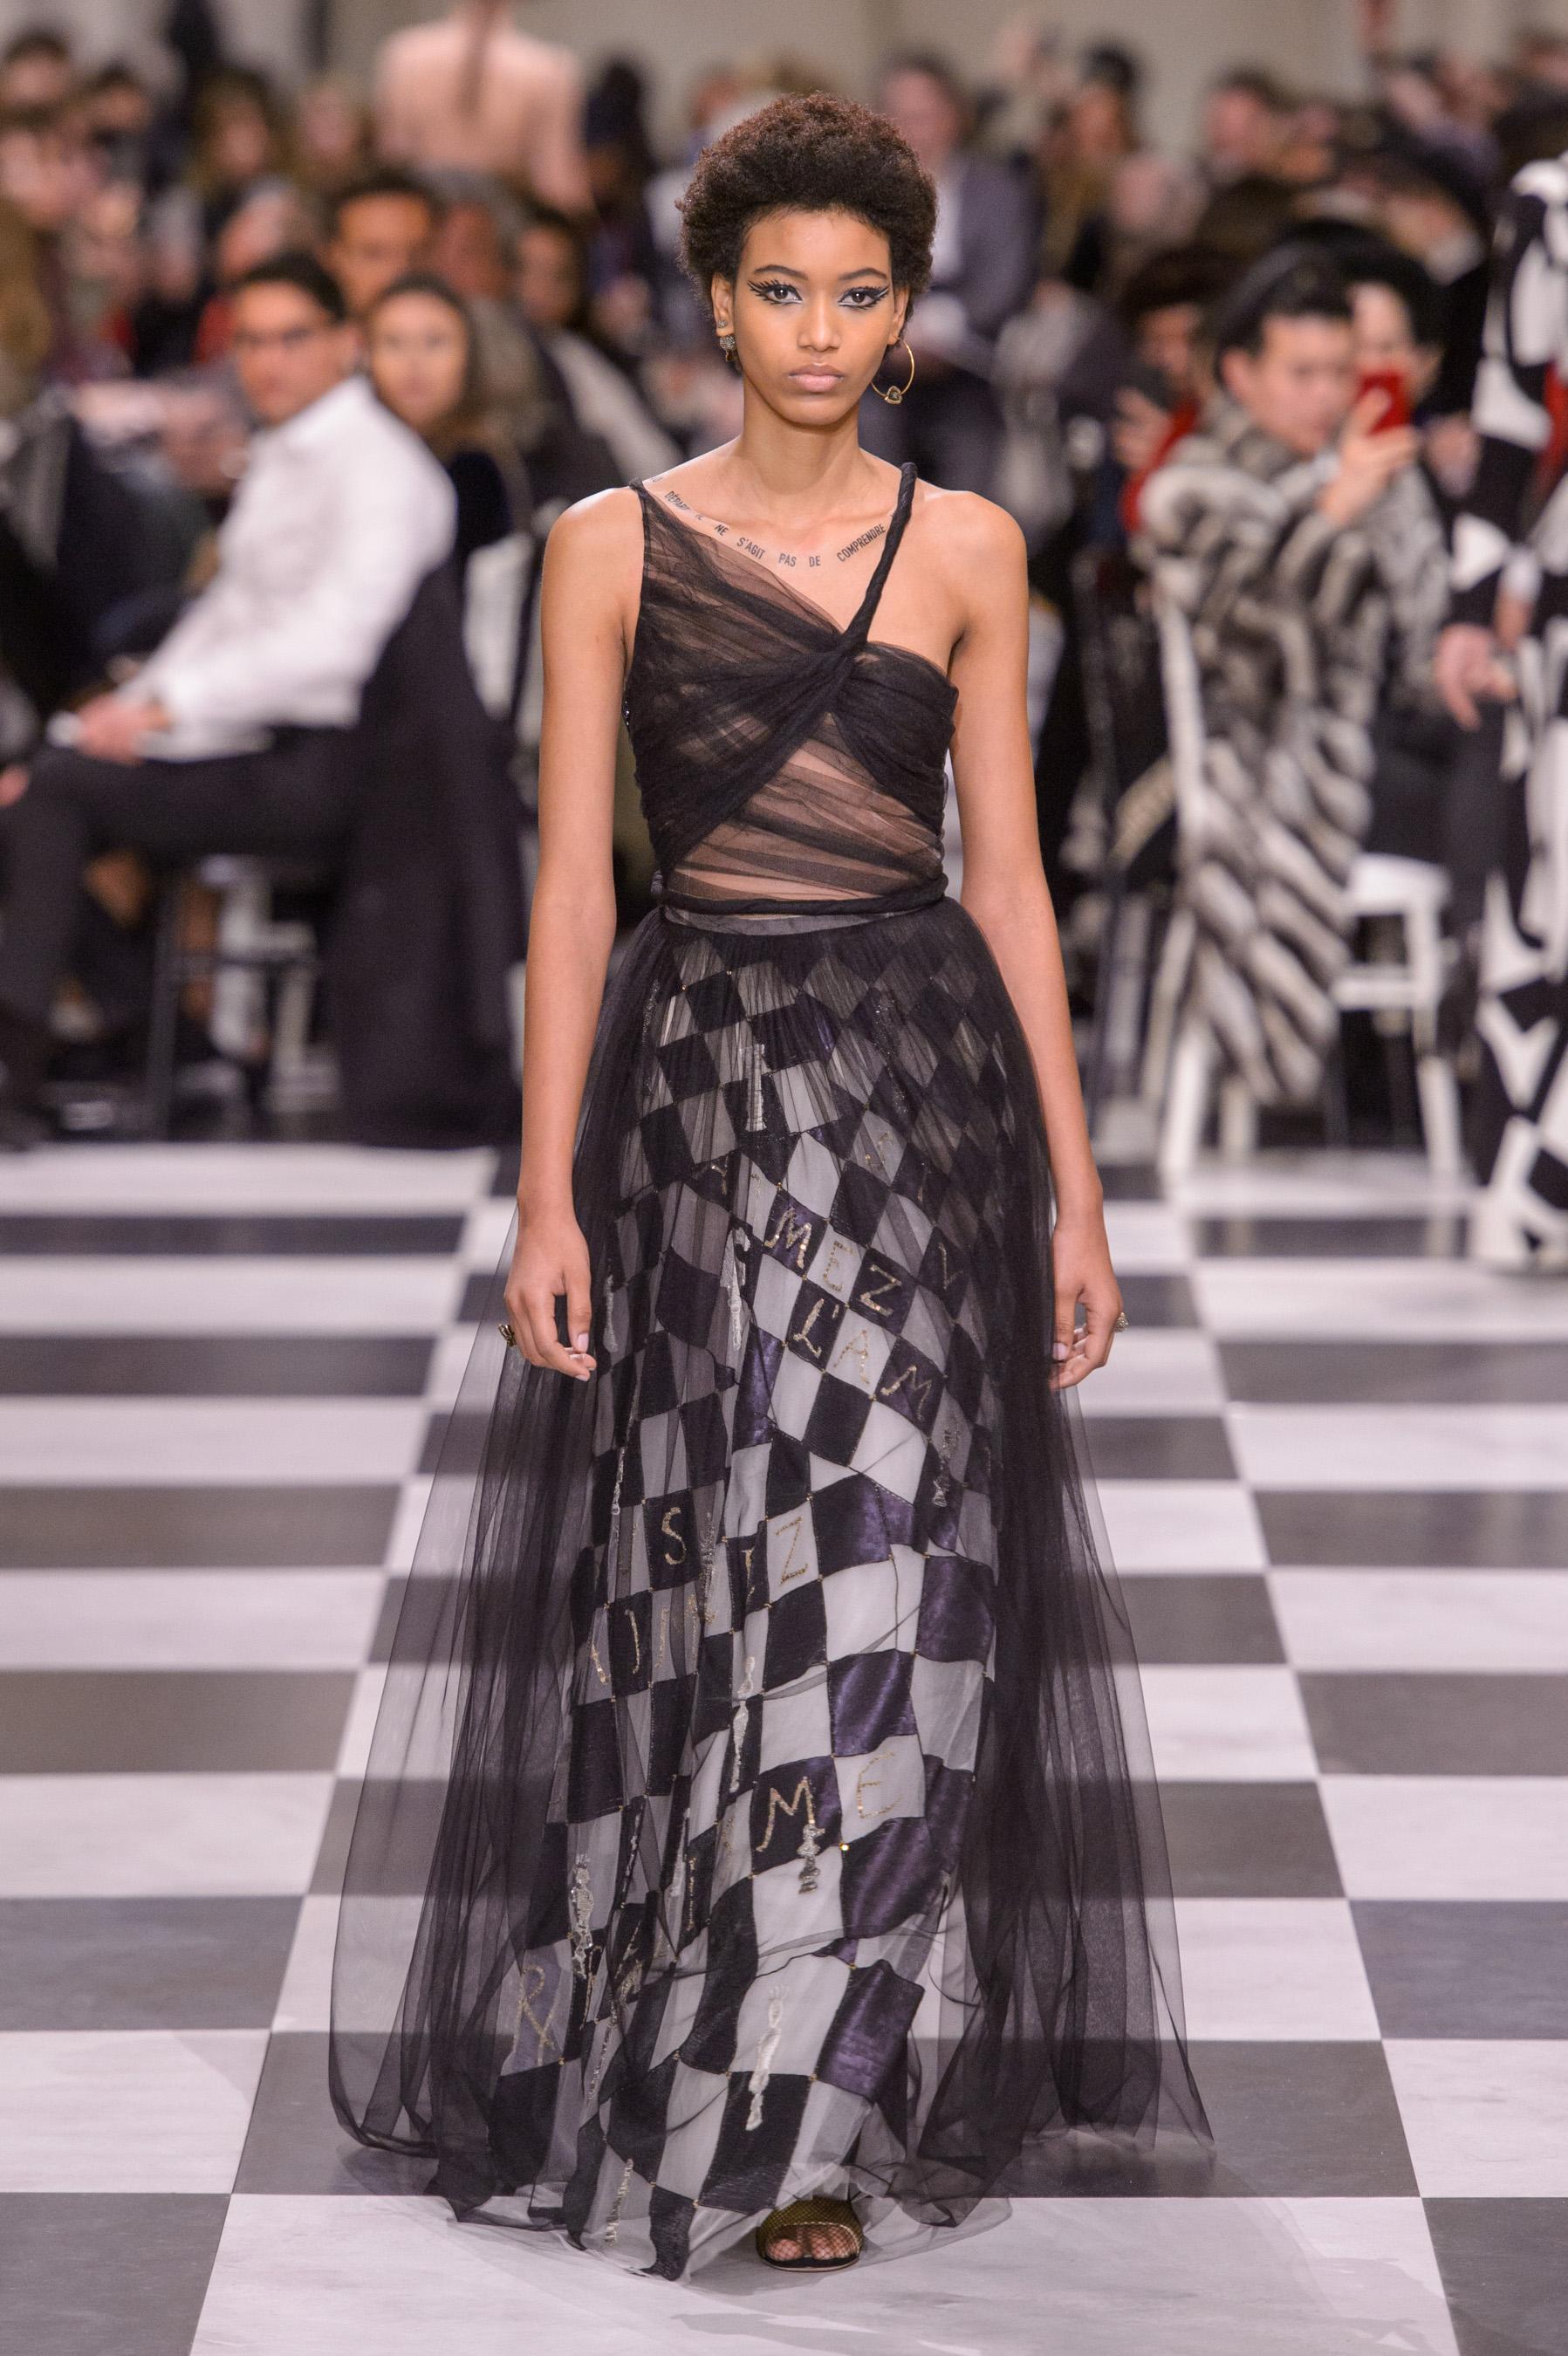 Défilé Christian Dior printemps-été 2018 Couture - Madame Figaro 167e43738bb